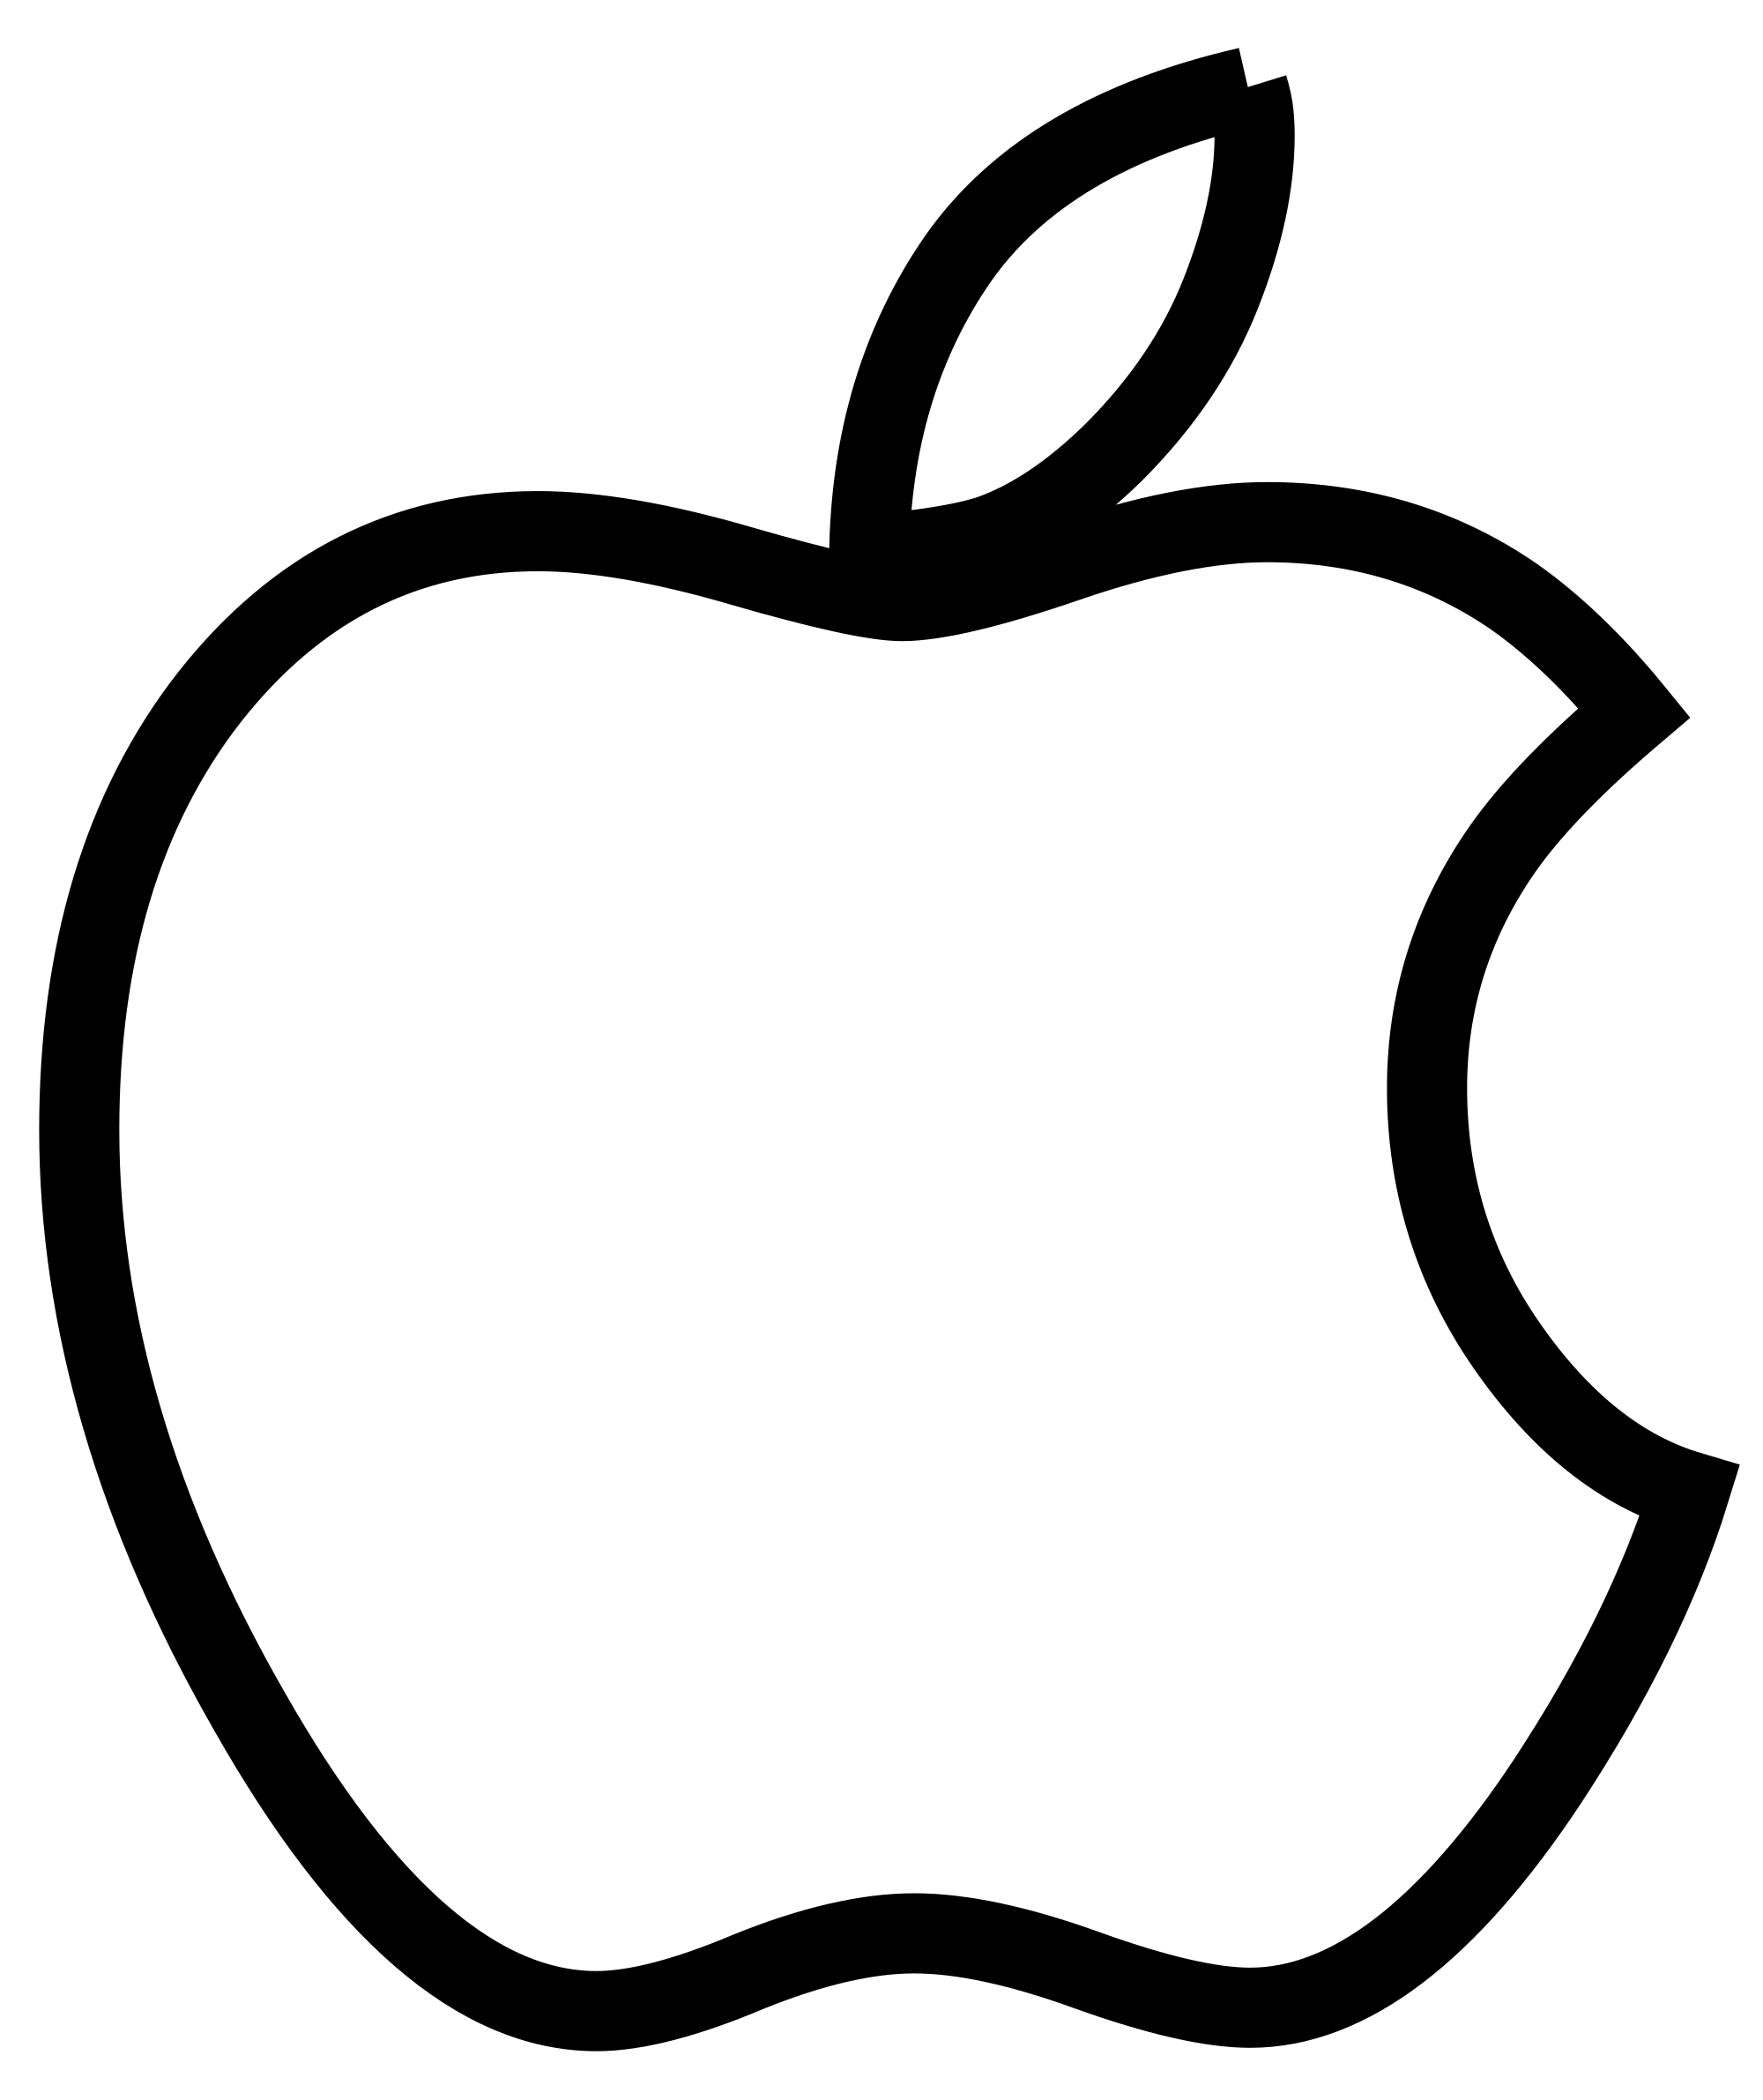 Apple Logo Clipart Black And White.